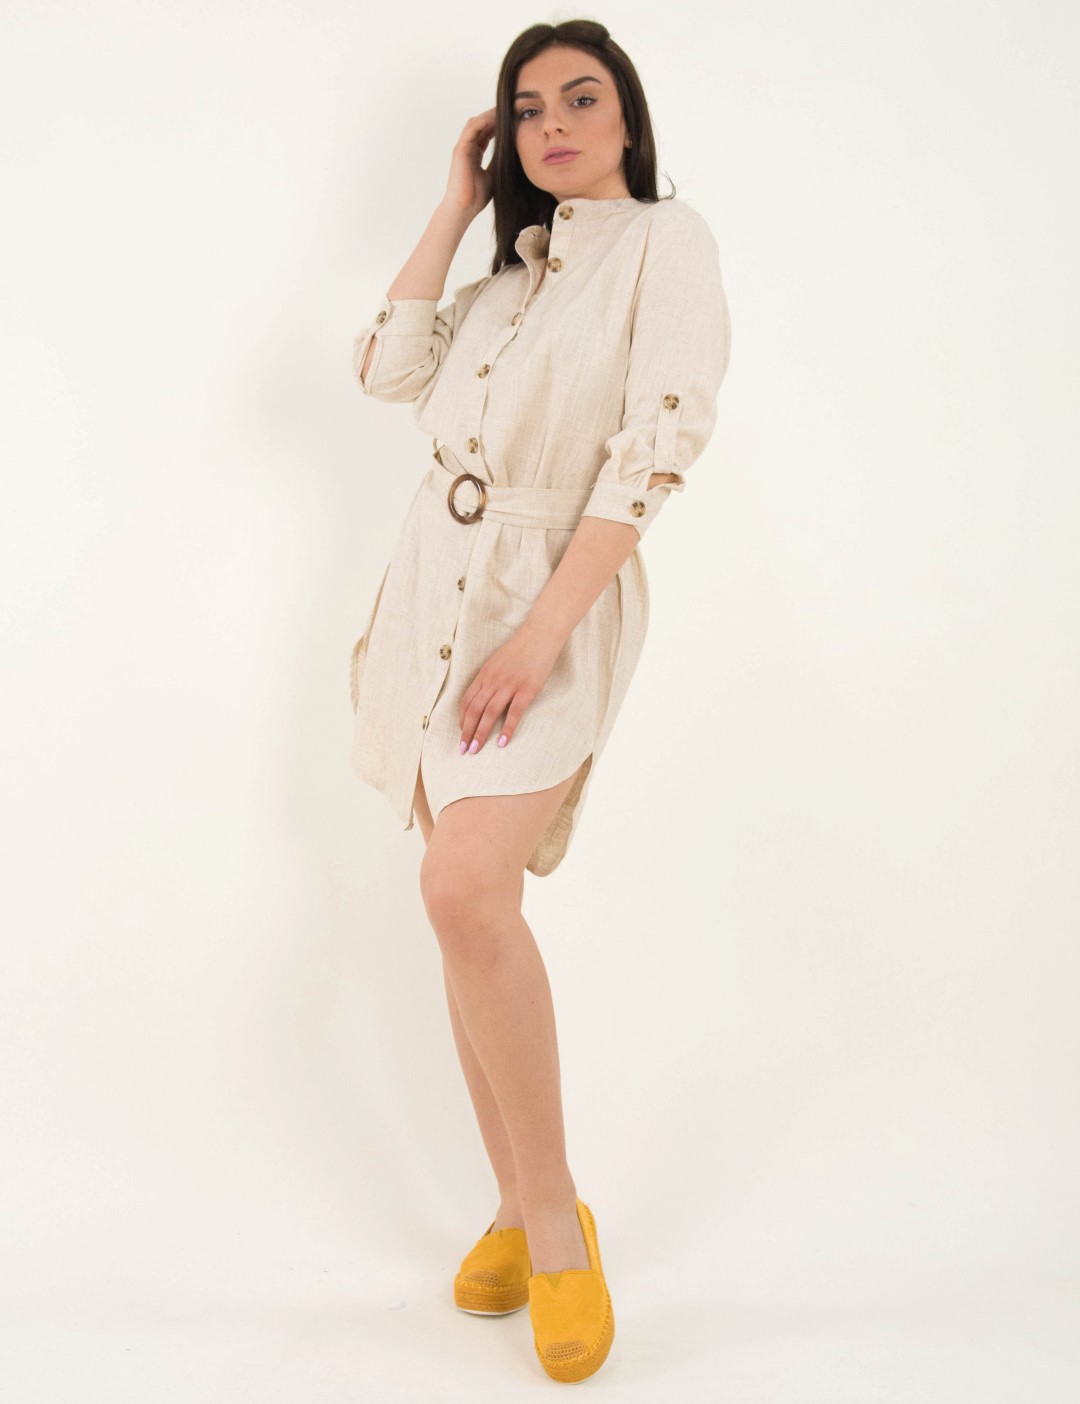 39639e8912b4 Γυναικείο μπεζ λινό πουκαμισοφόρεμα μάο γιακάς Coocu 21076